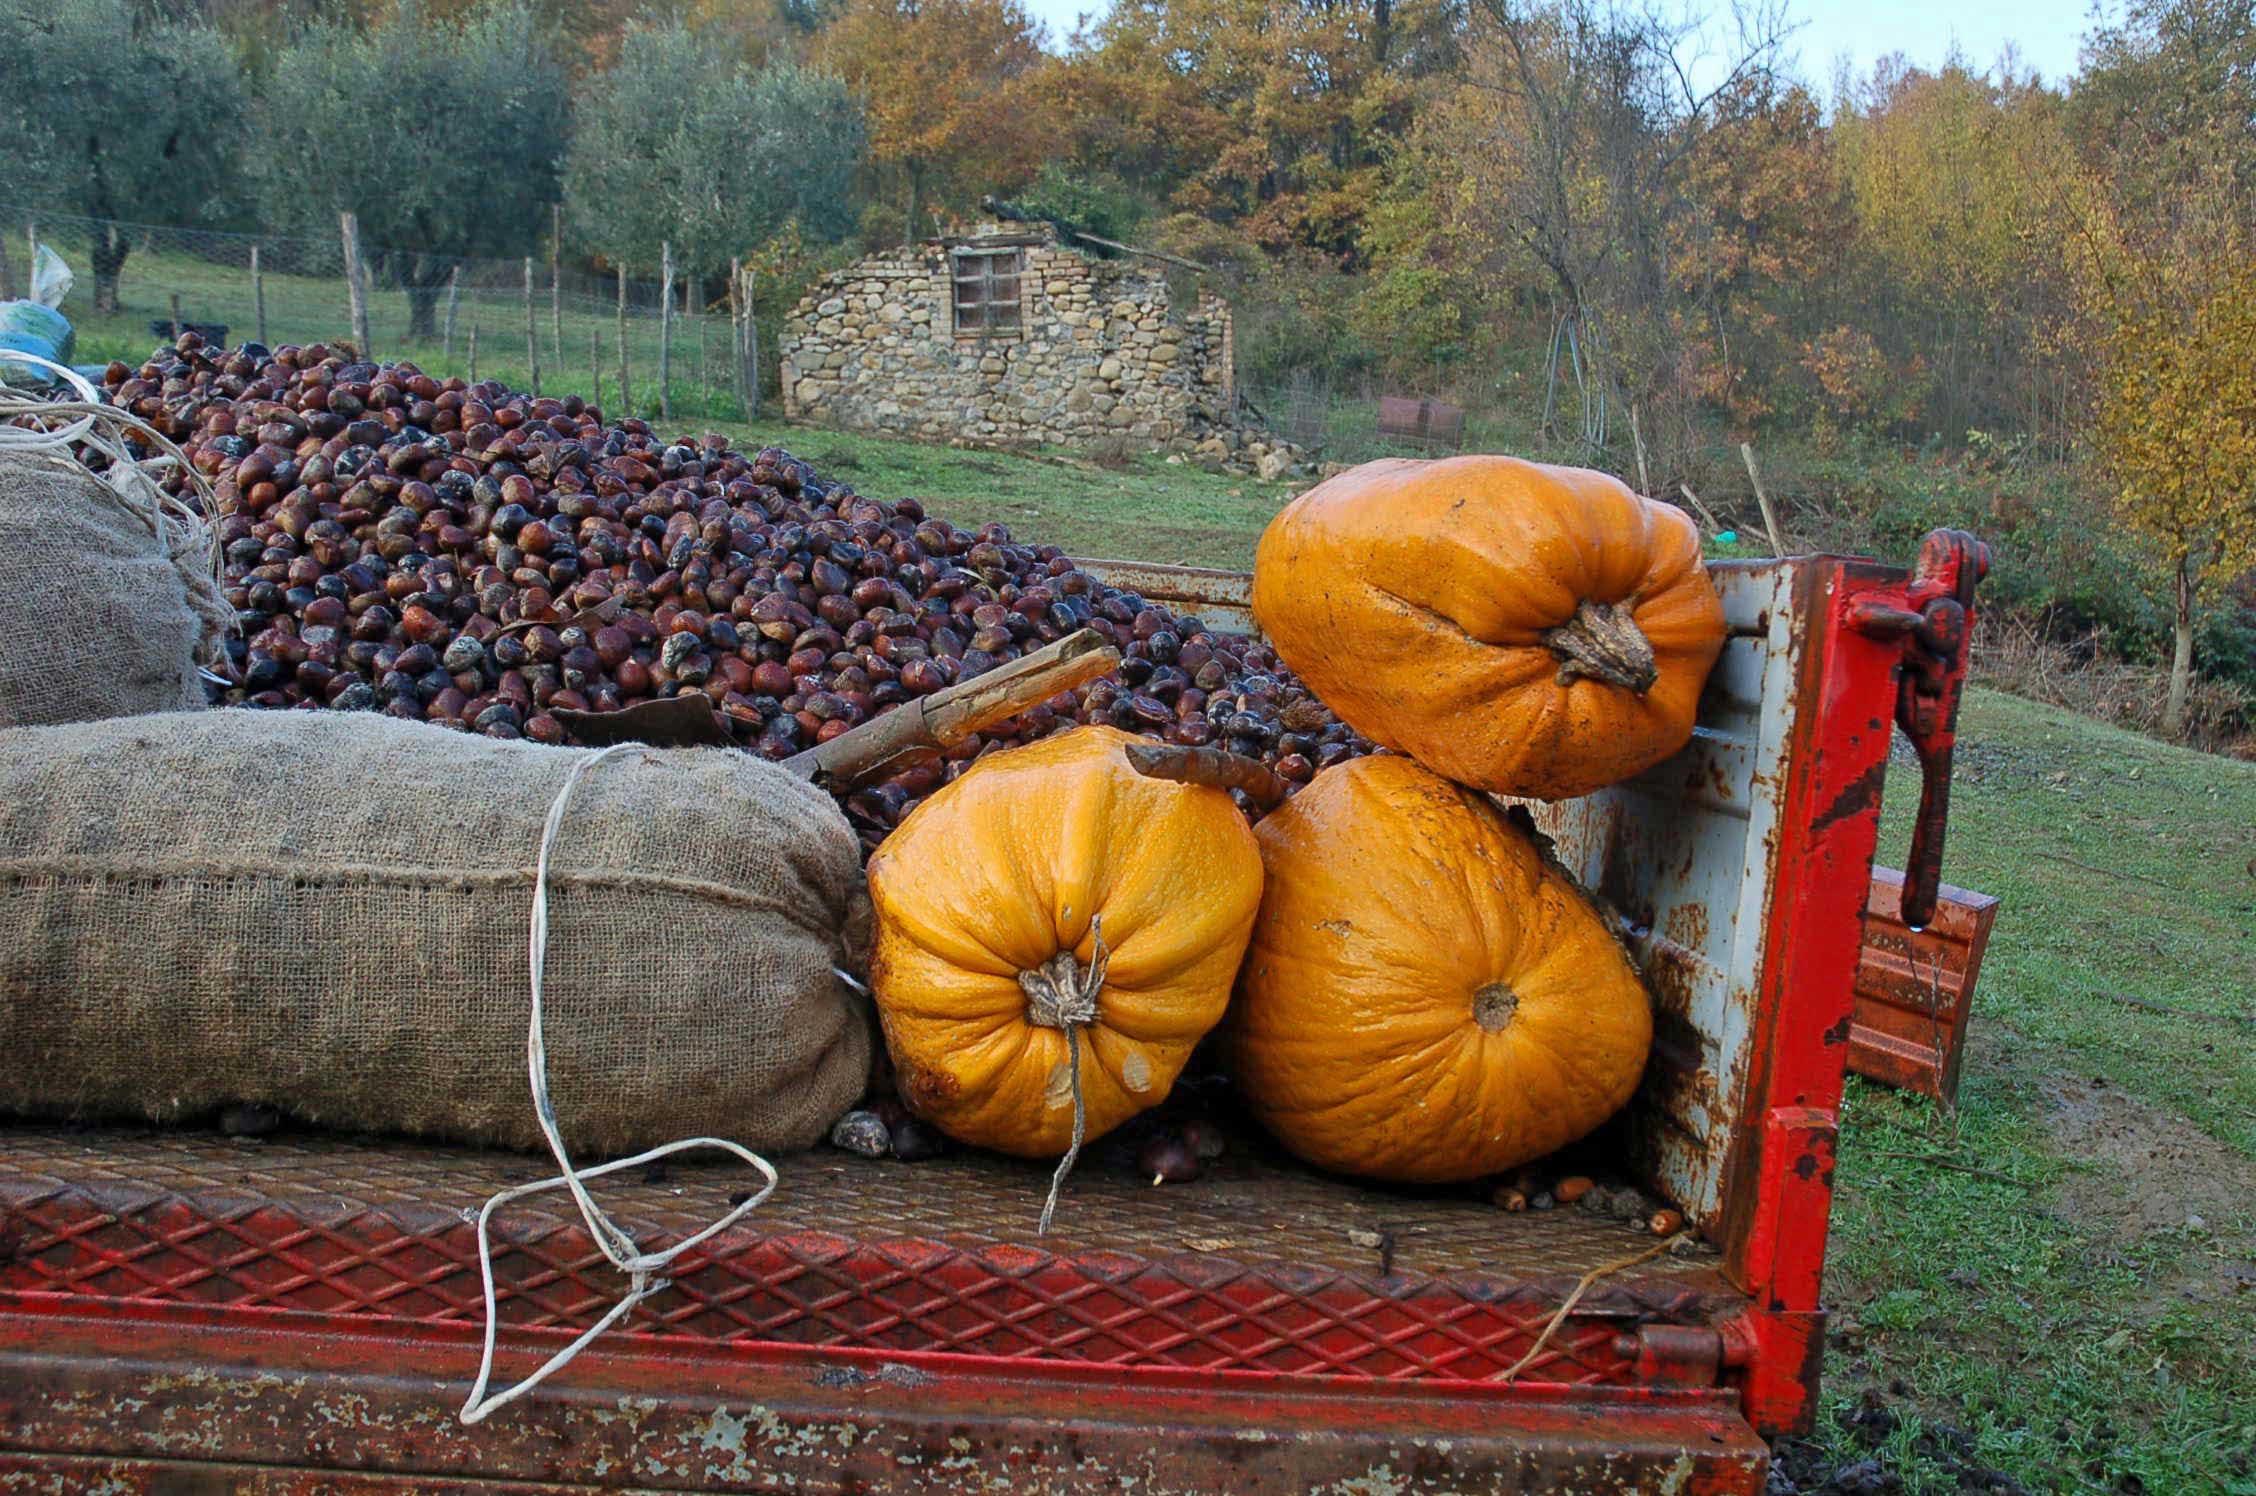 Chestnuts and pumpkins